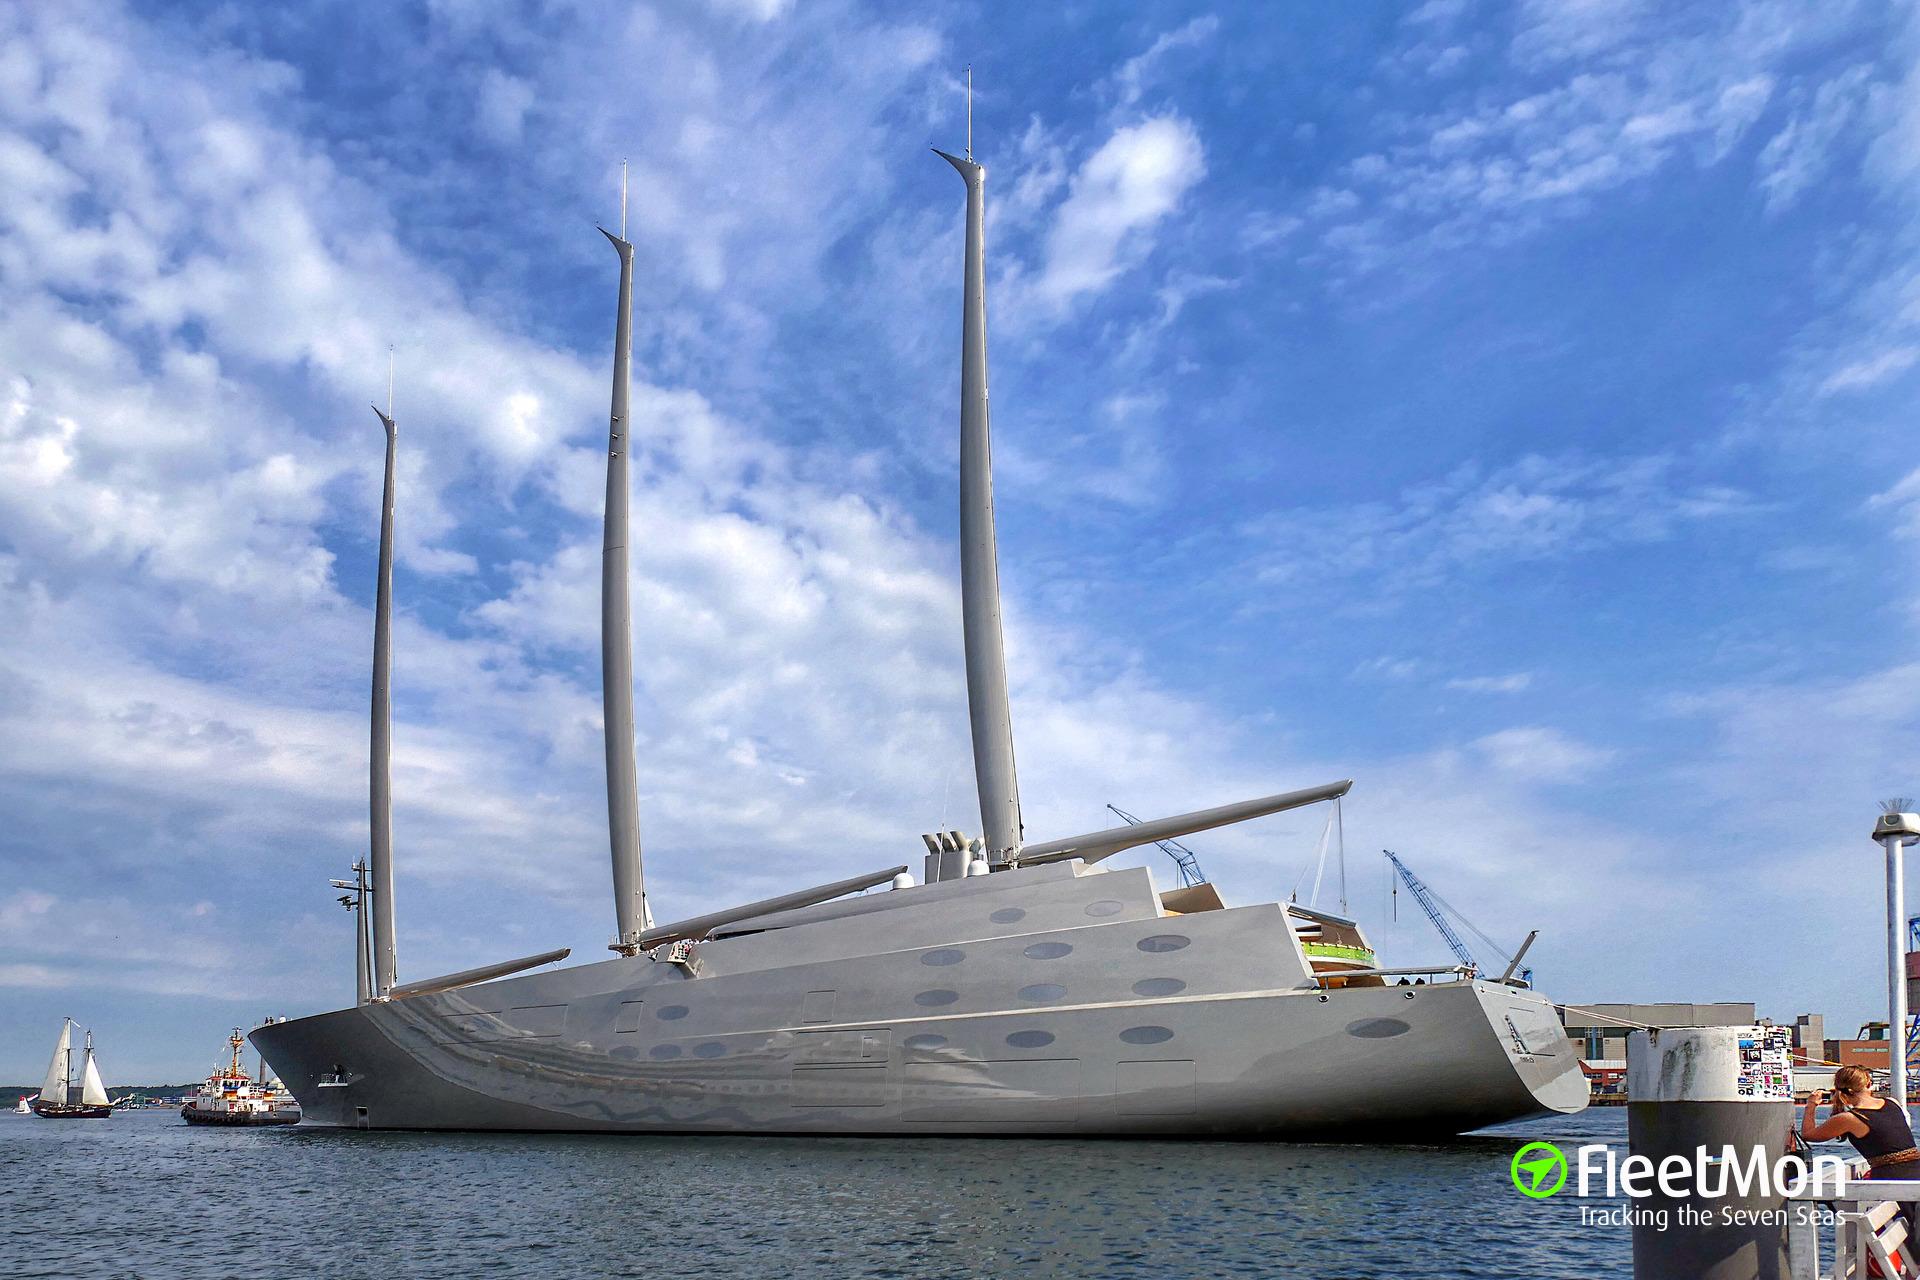 Sailing Yacht A >> Photo Of Sailing Yacht A Imo 1012141 Mmsi 310763000